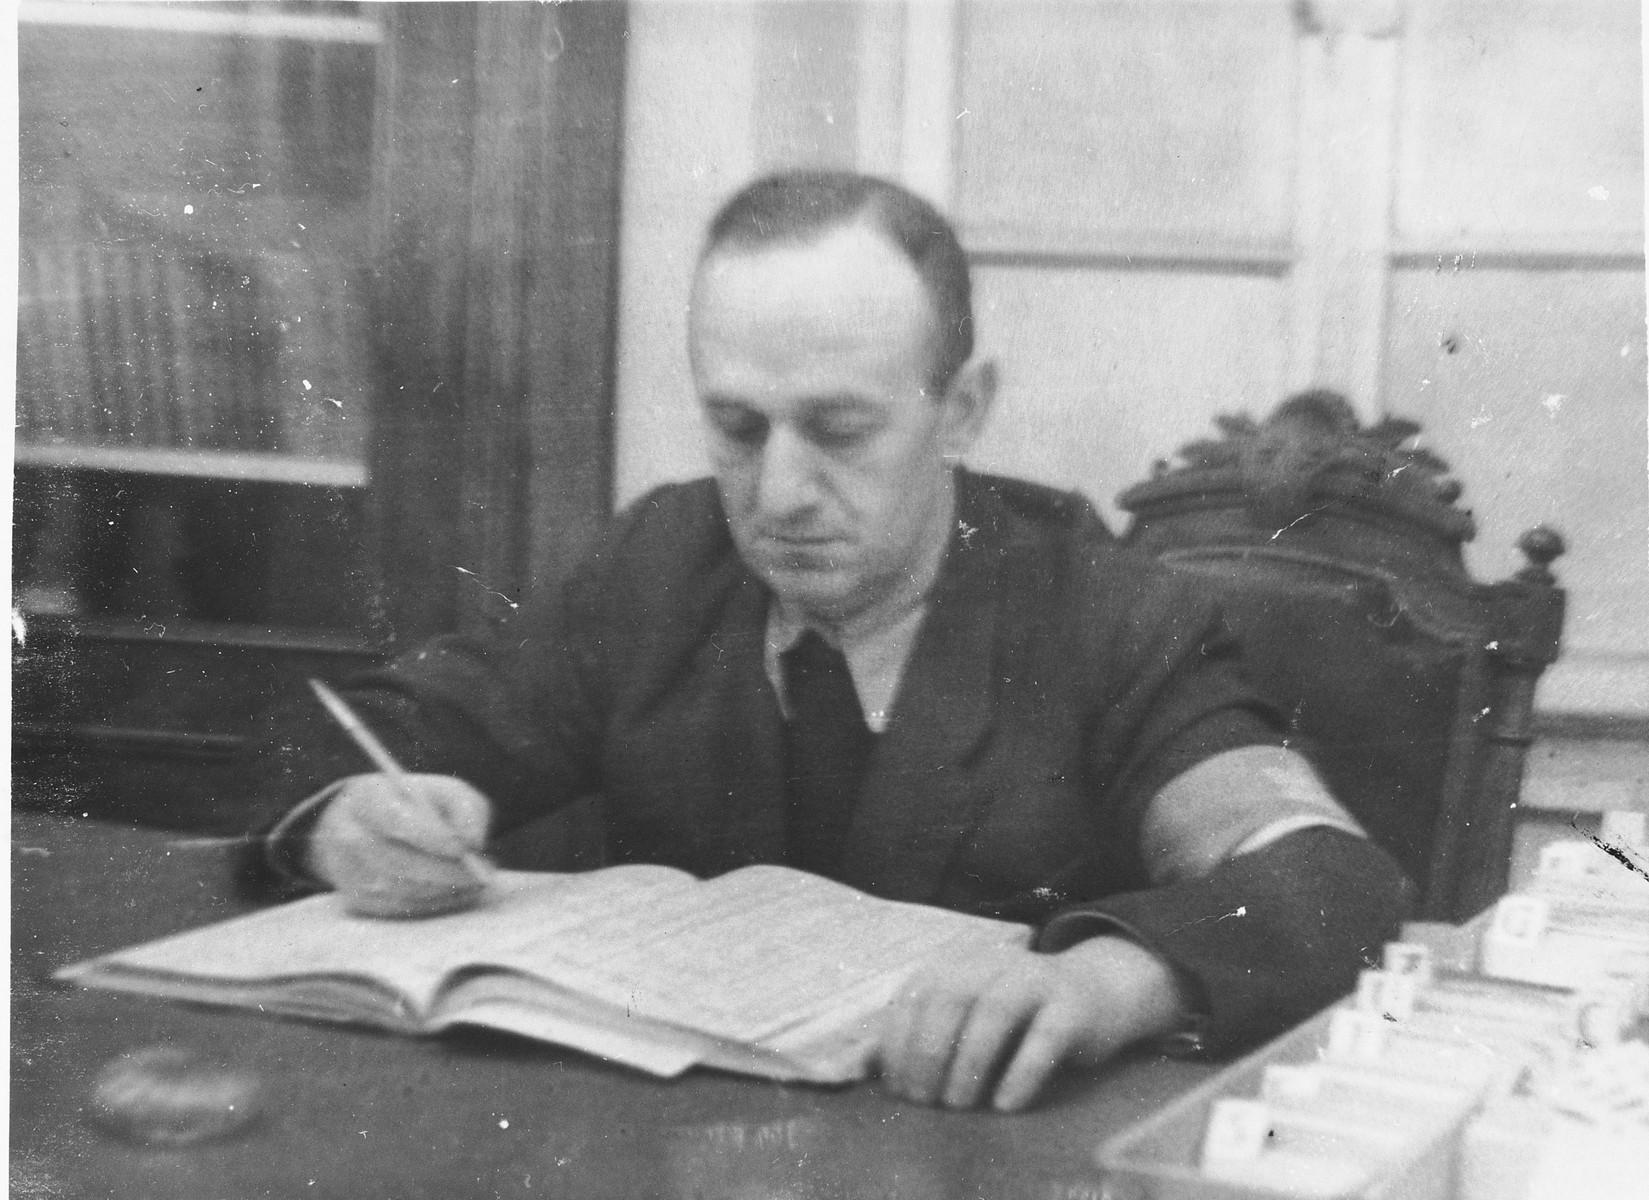 Ghetto police chief Ferdinand Beigel writes in a ledger at his desk in the Vilna ghetto.